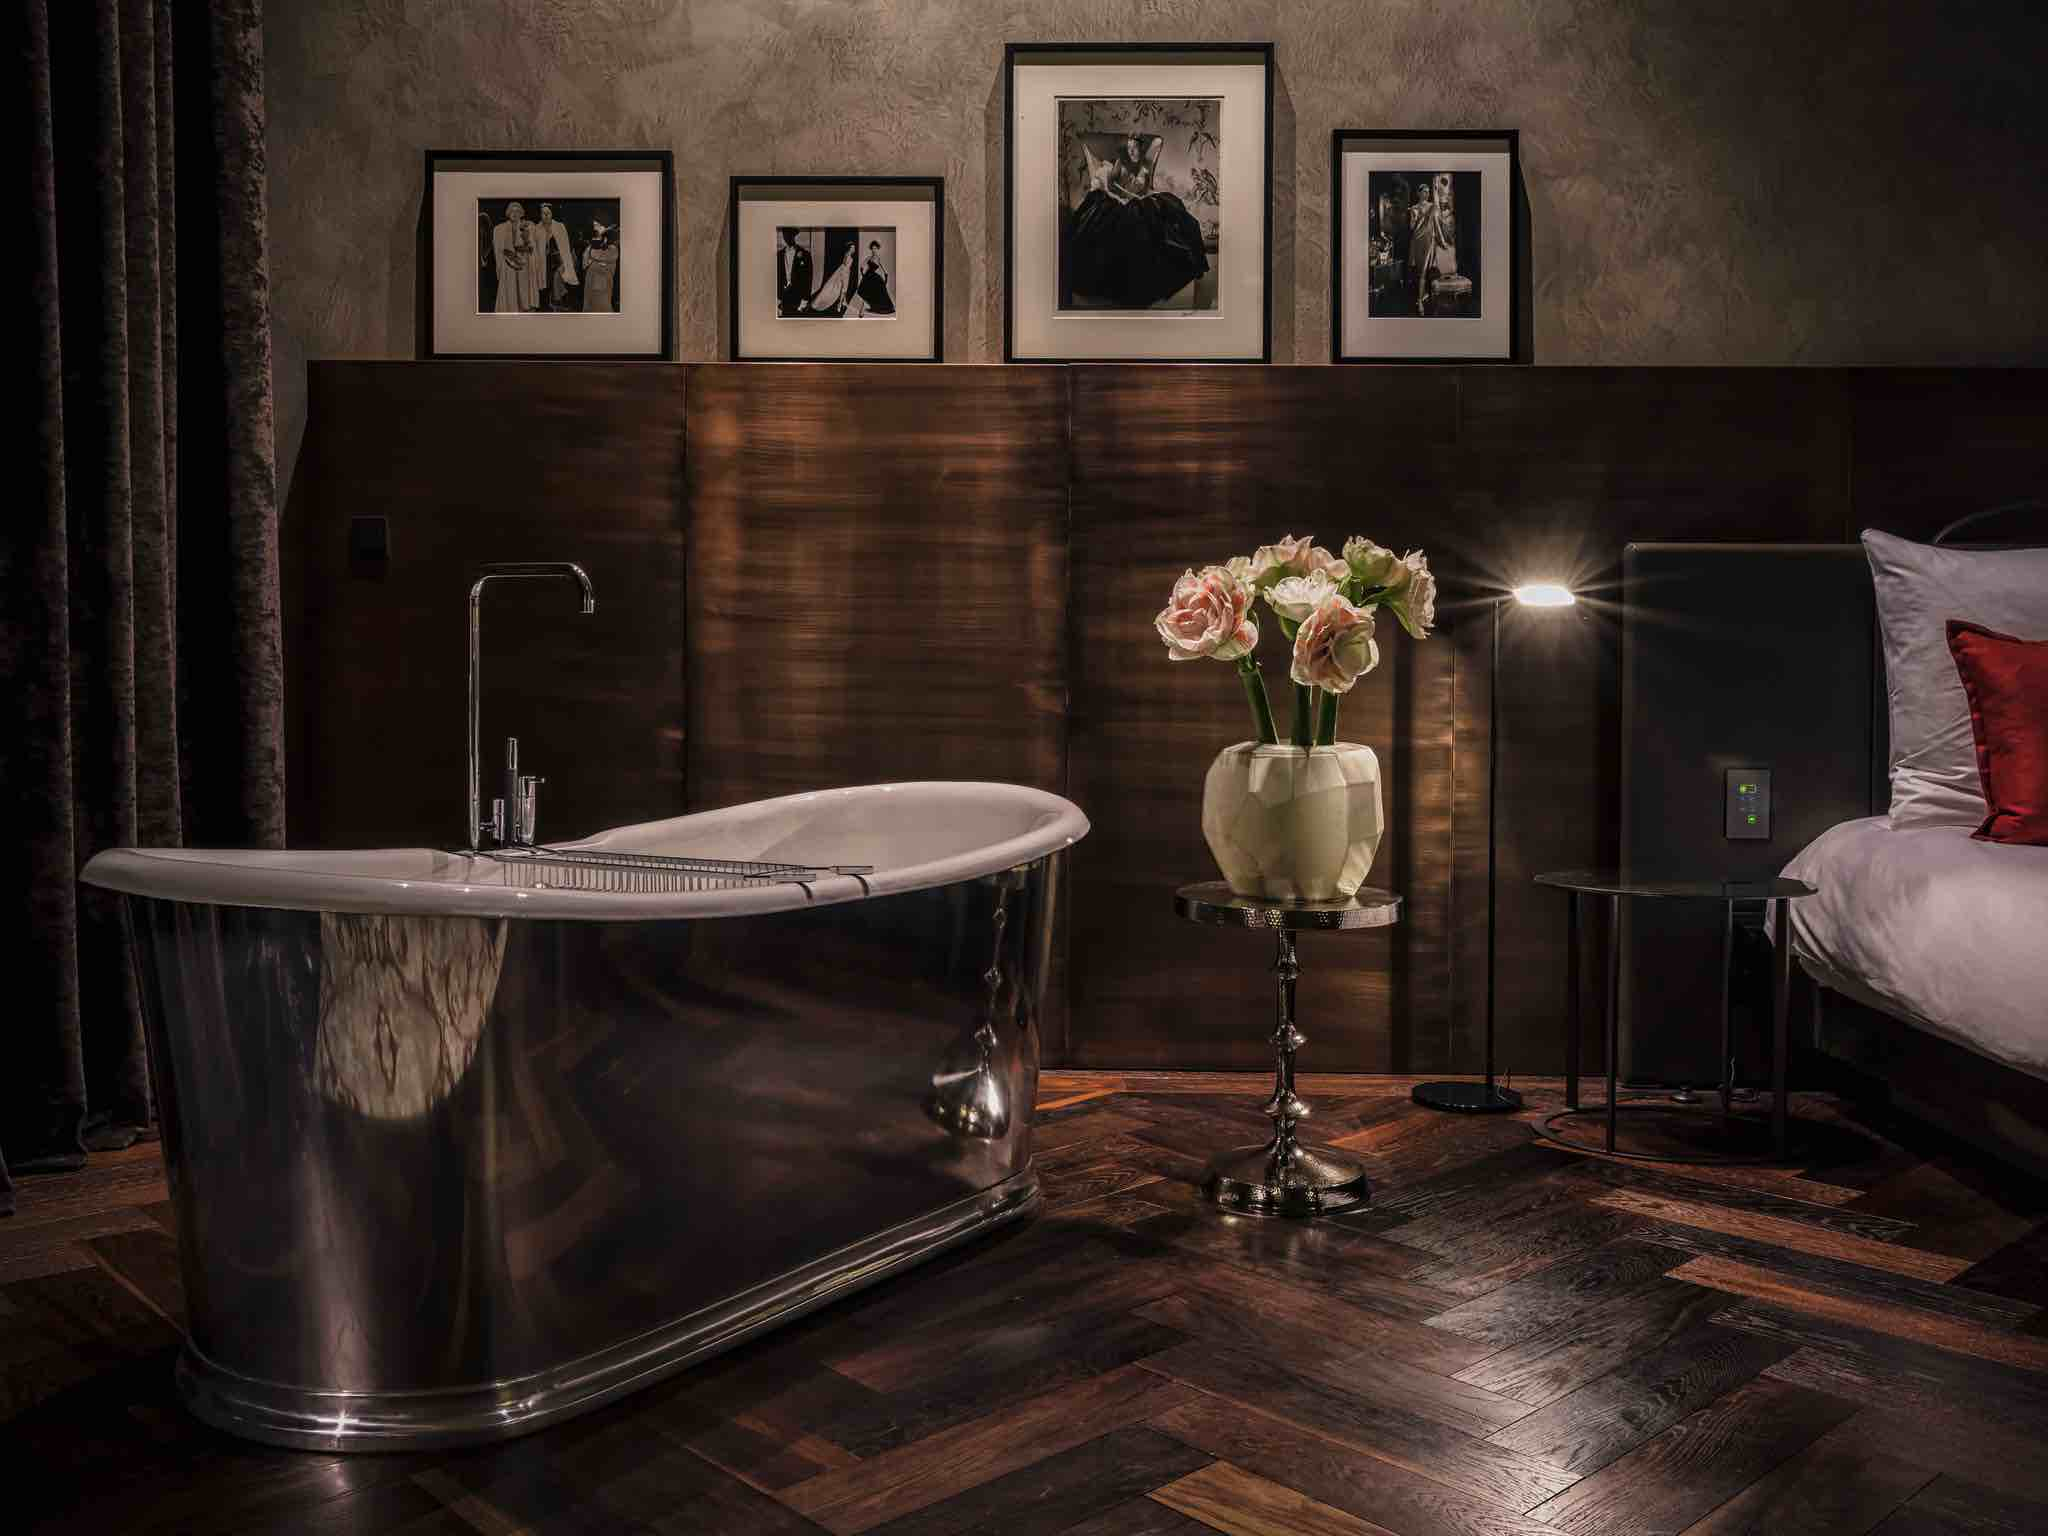 Das Stue luxury boutique hotel in Berlin bedroom with fancy bathtub